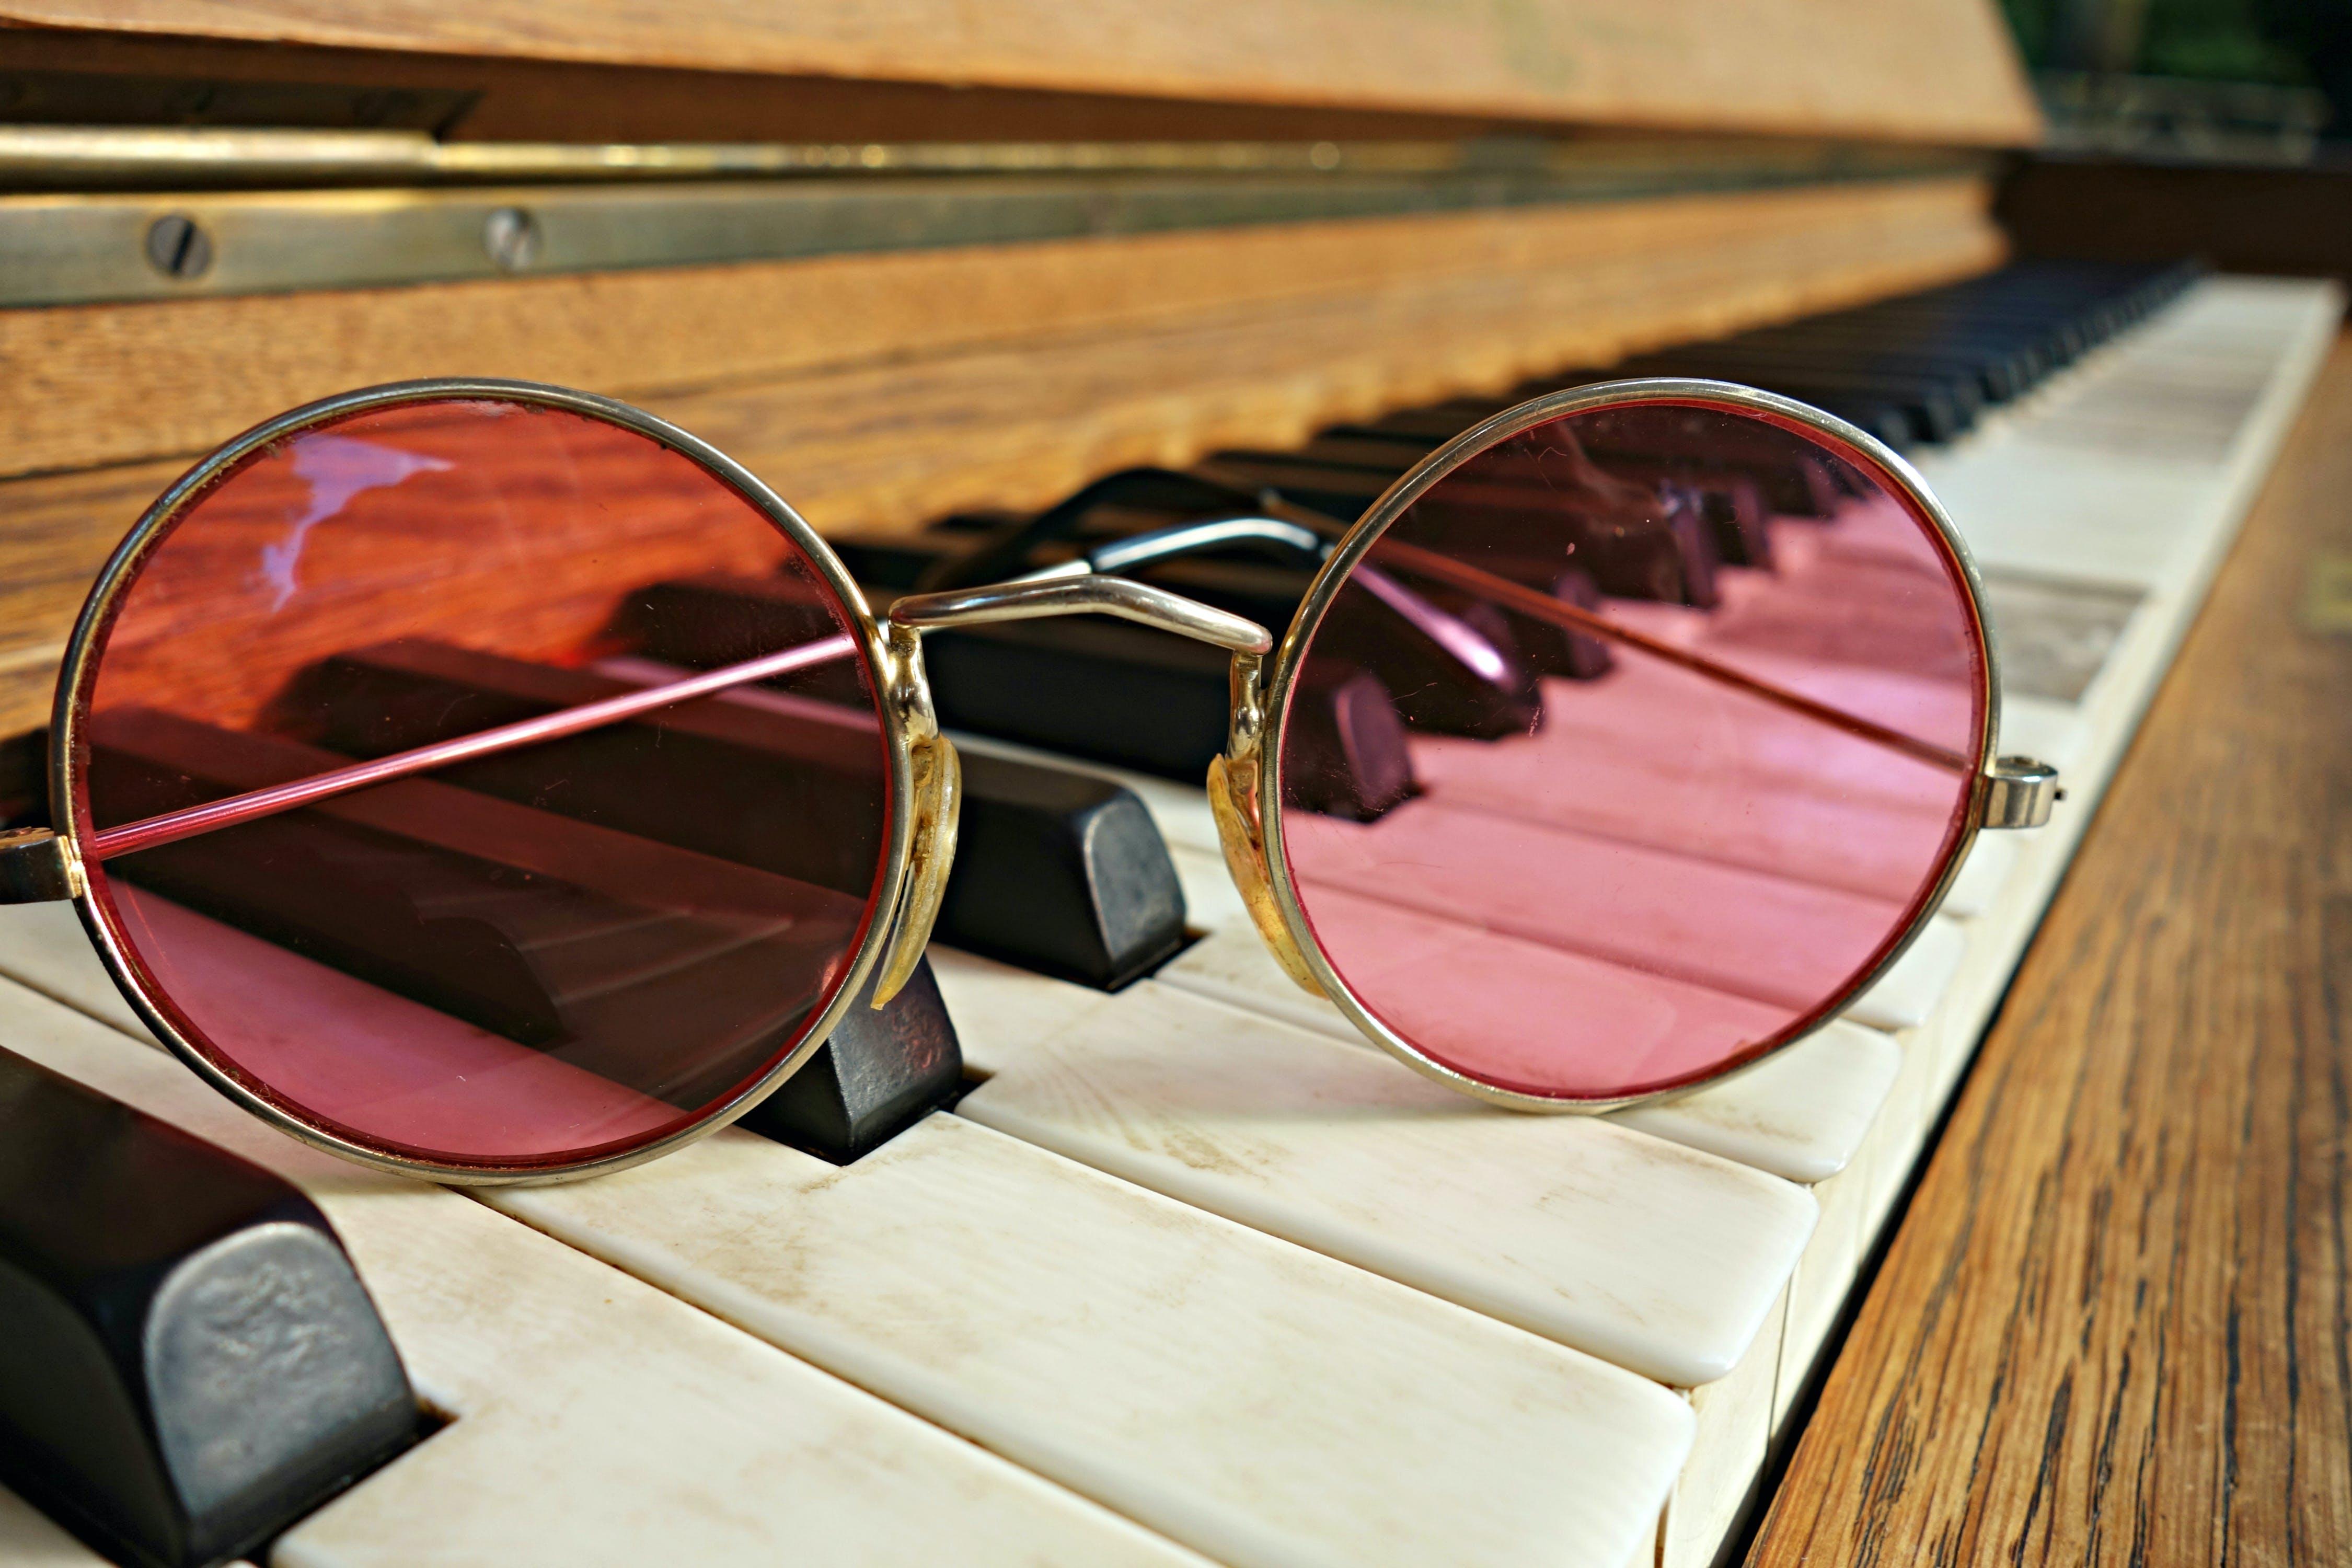 88, glasses, music